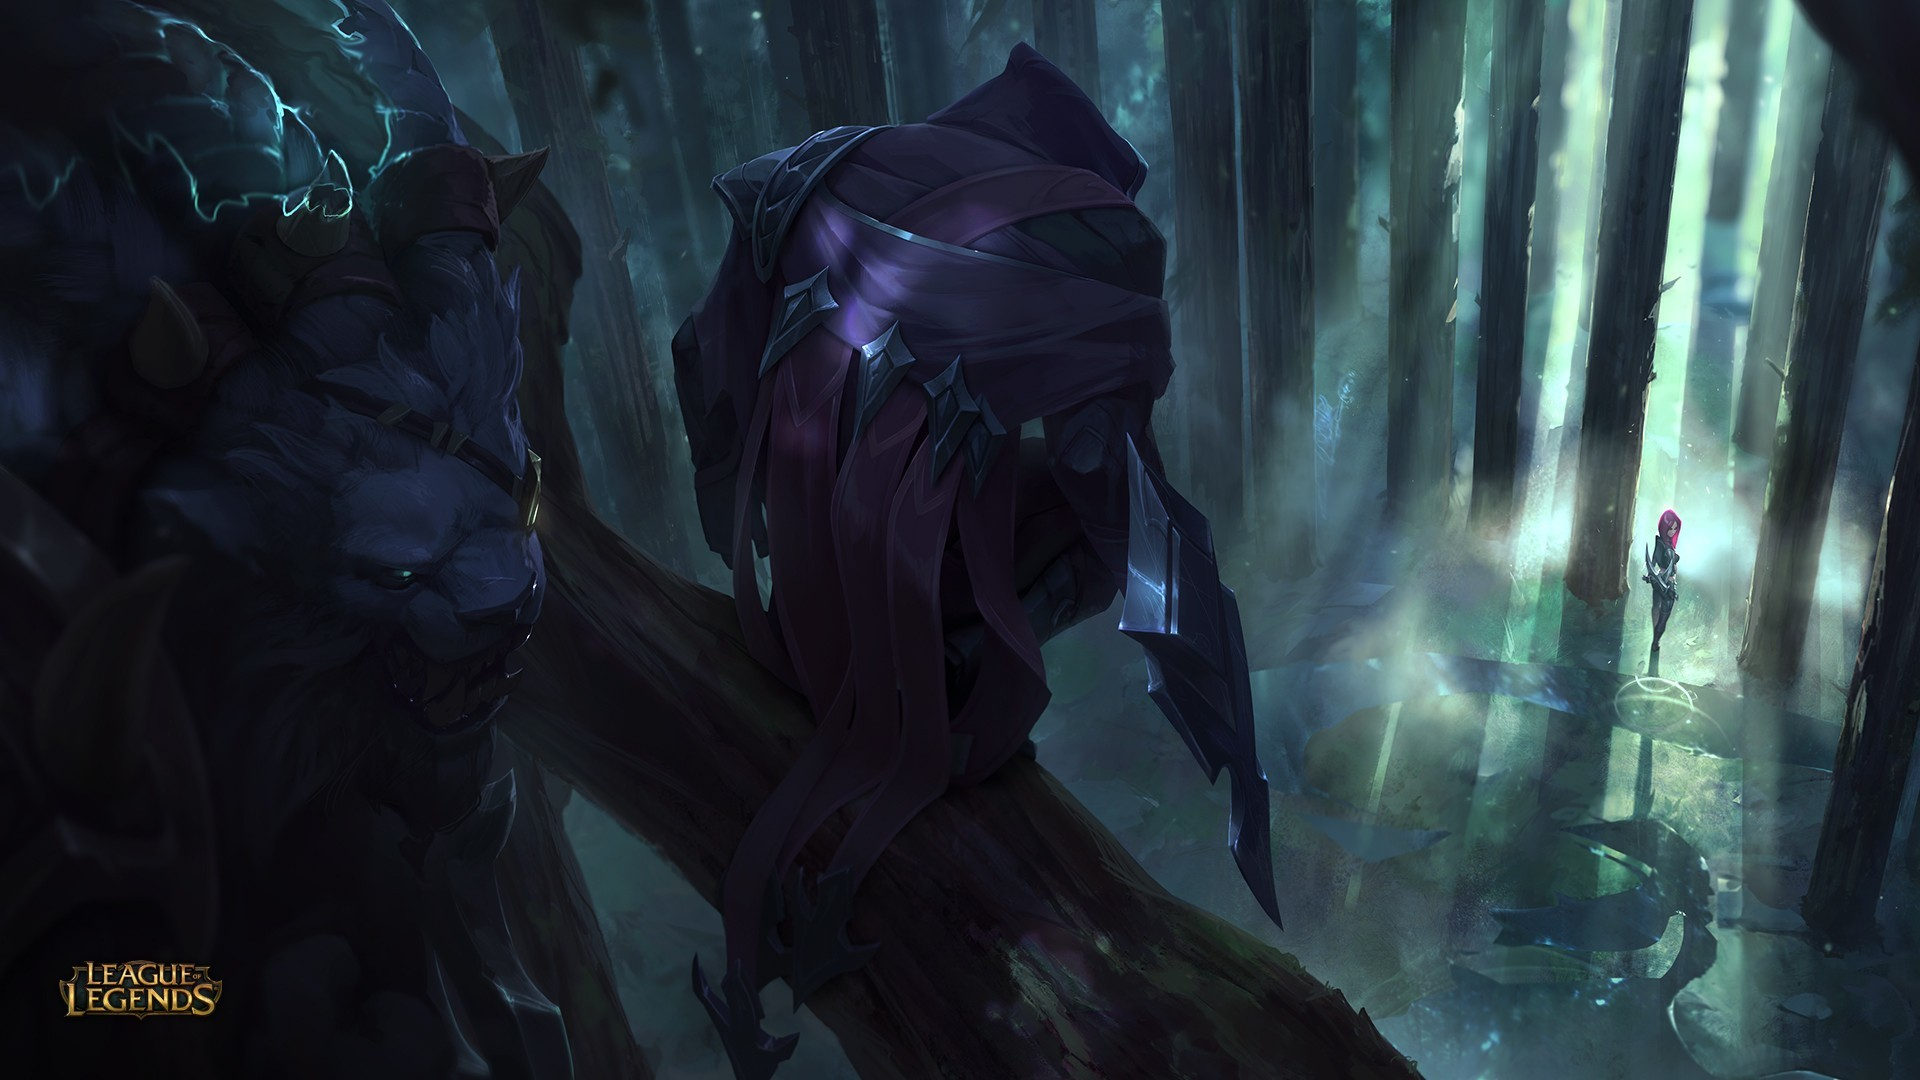 General Summoner's Rift League of Legends Talon (League of  Legends) katarina (league